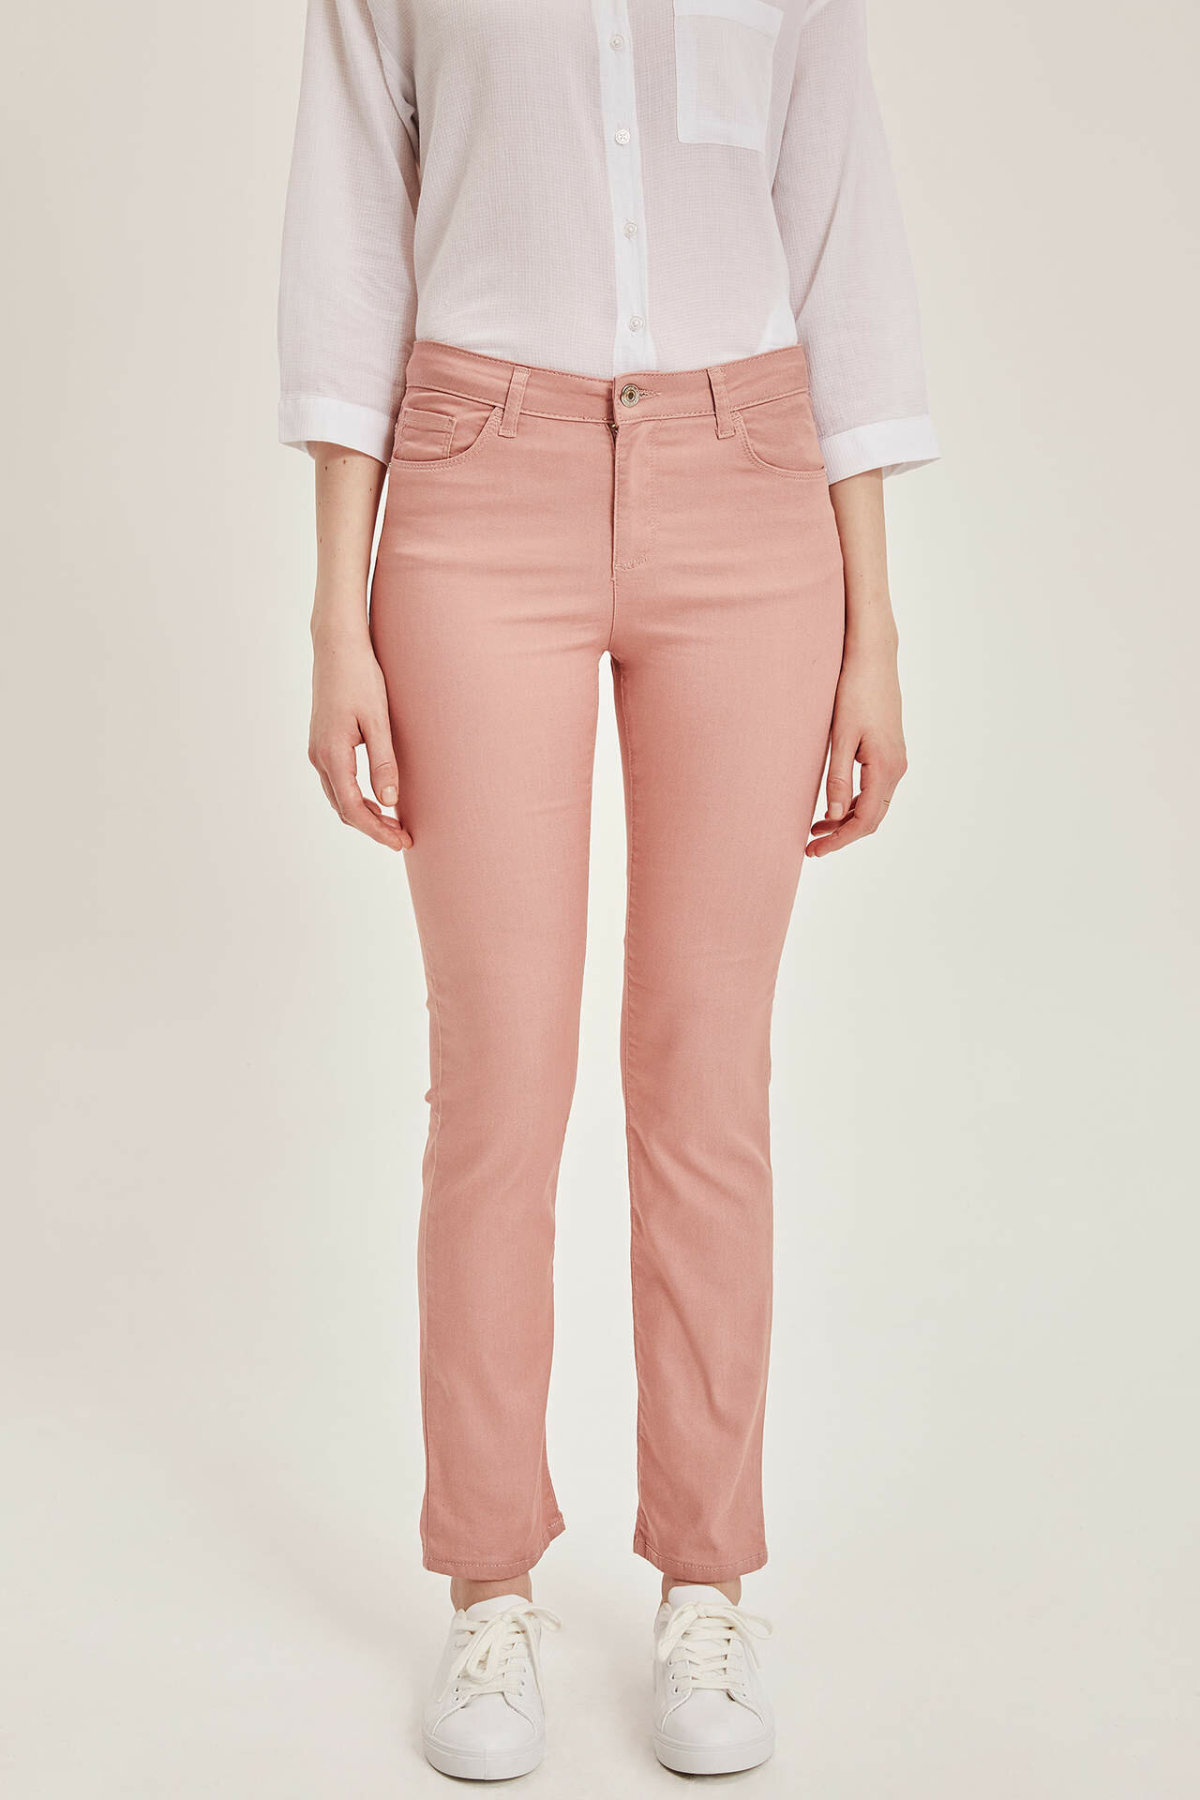 DeFacto Fashion Woman Office Mid Waist Trousers Casual Solid Work Wear Elastic Skinny Pants Autumn Female New - J8754AZ19SP